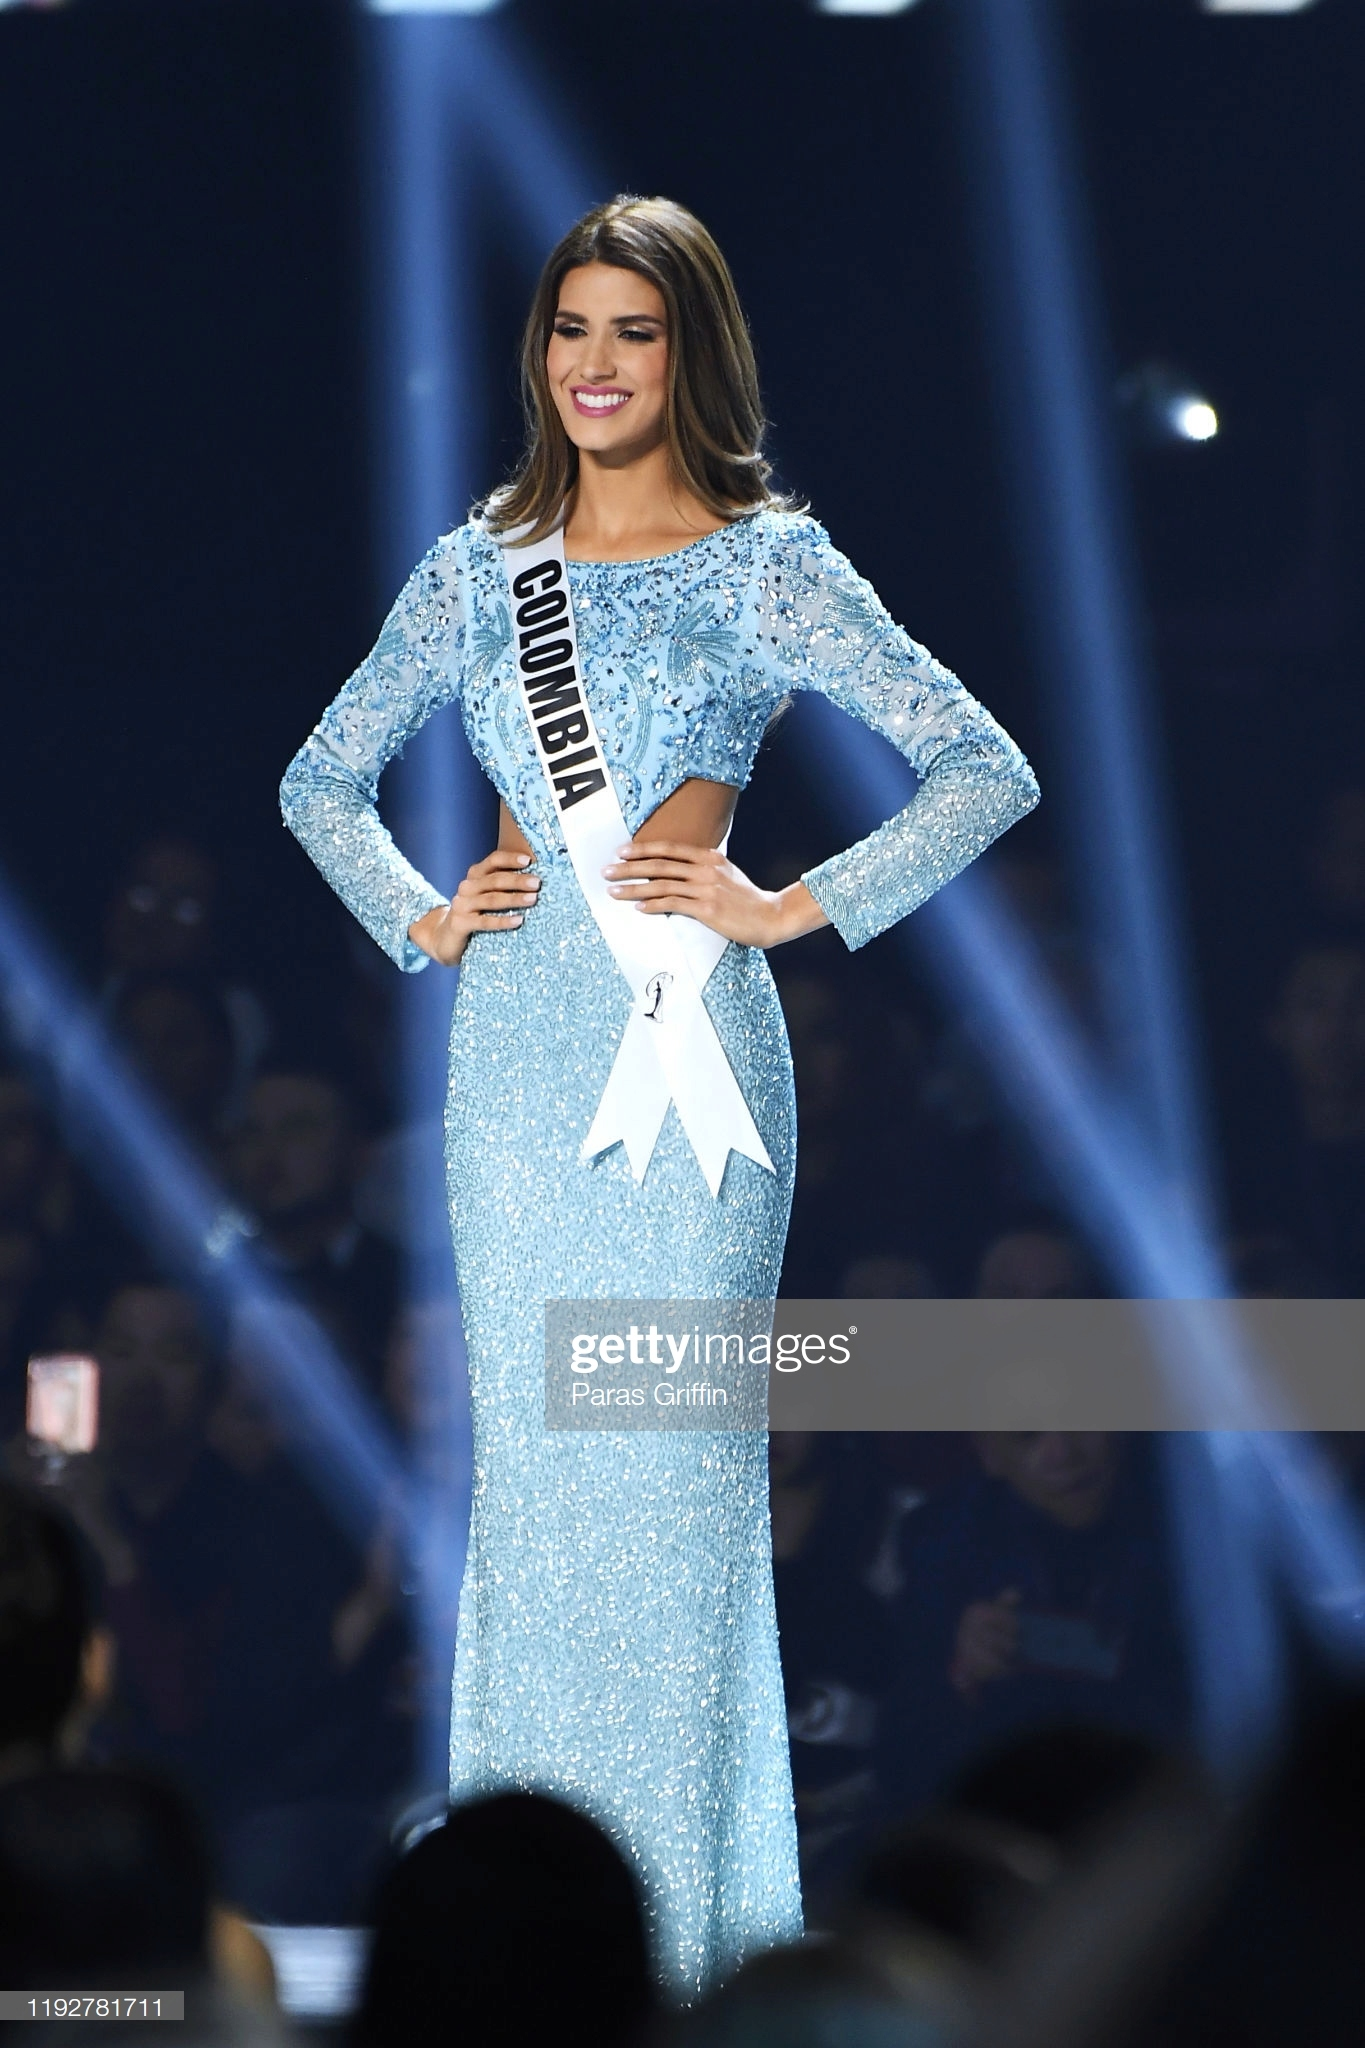 gabriela tafur, top 5 de miss universe 2019. - Página 27 Miss-c14